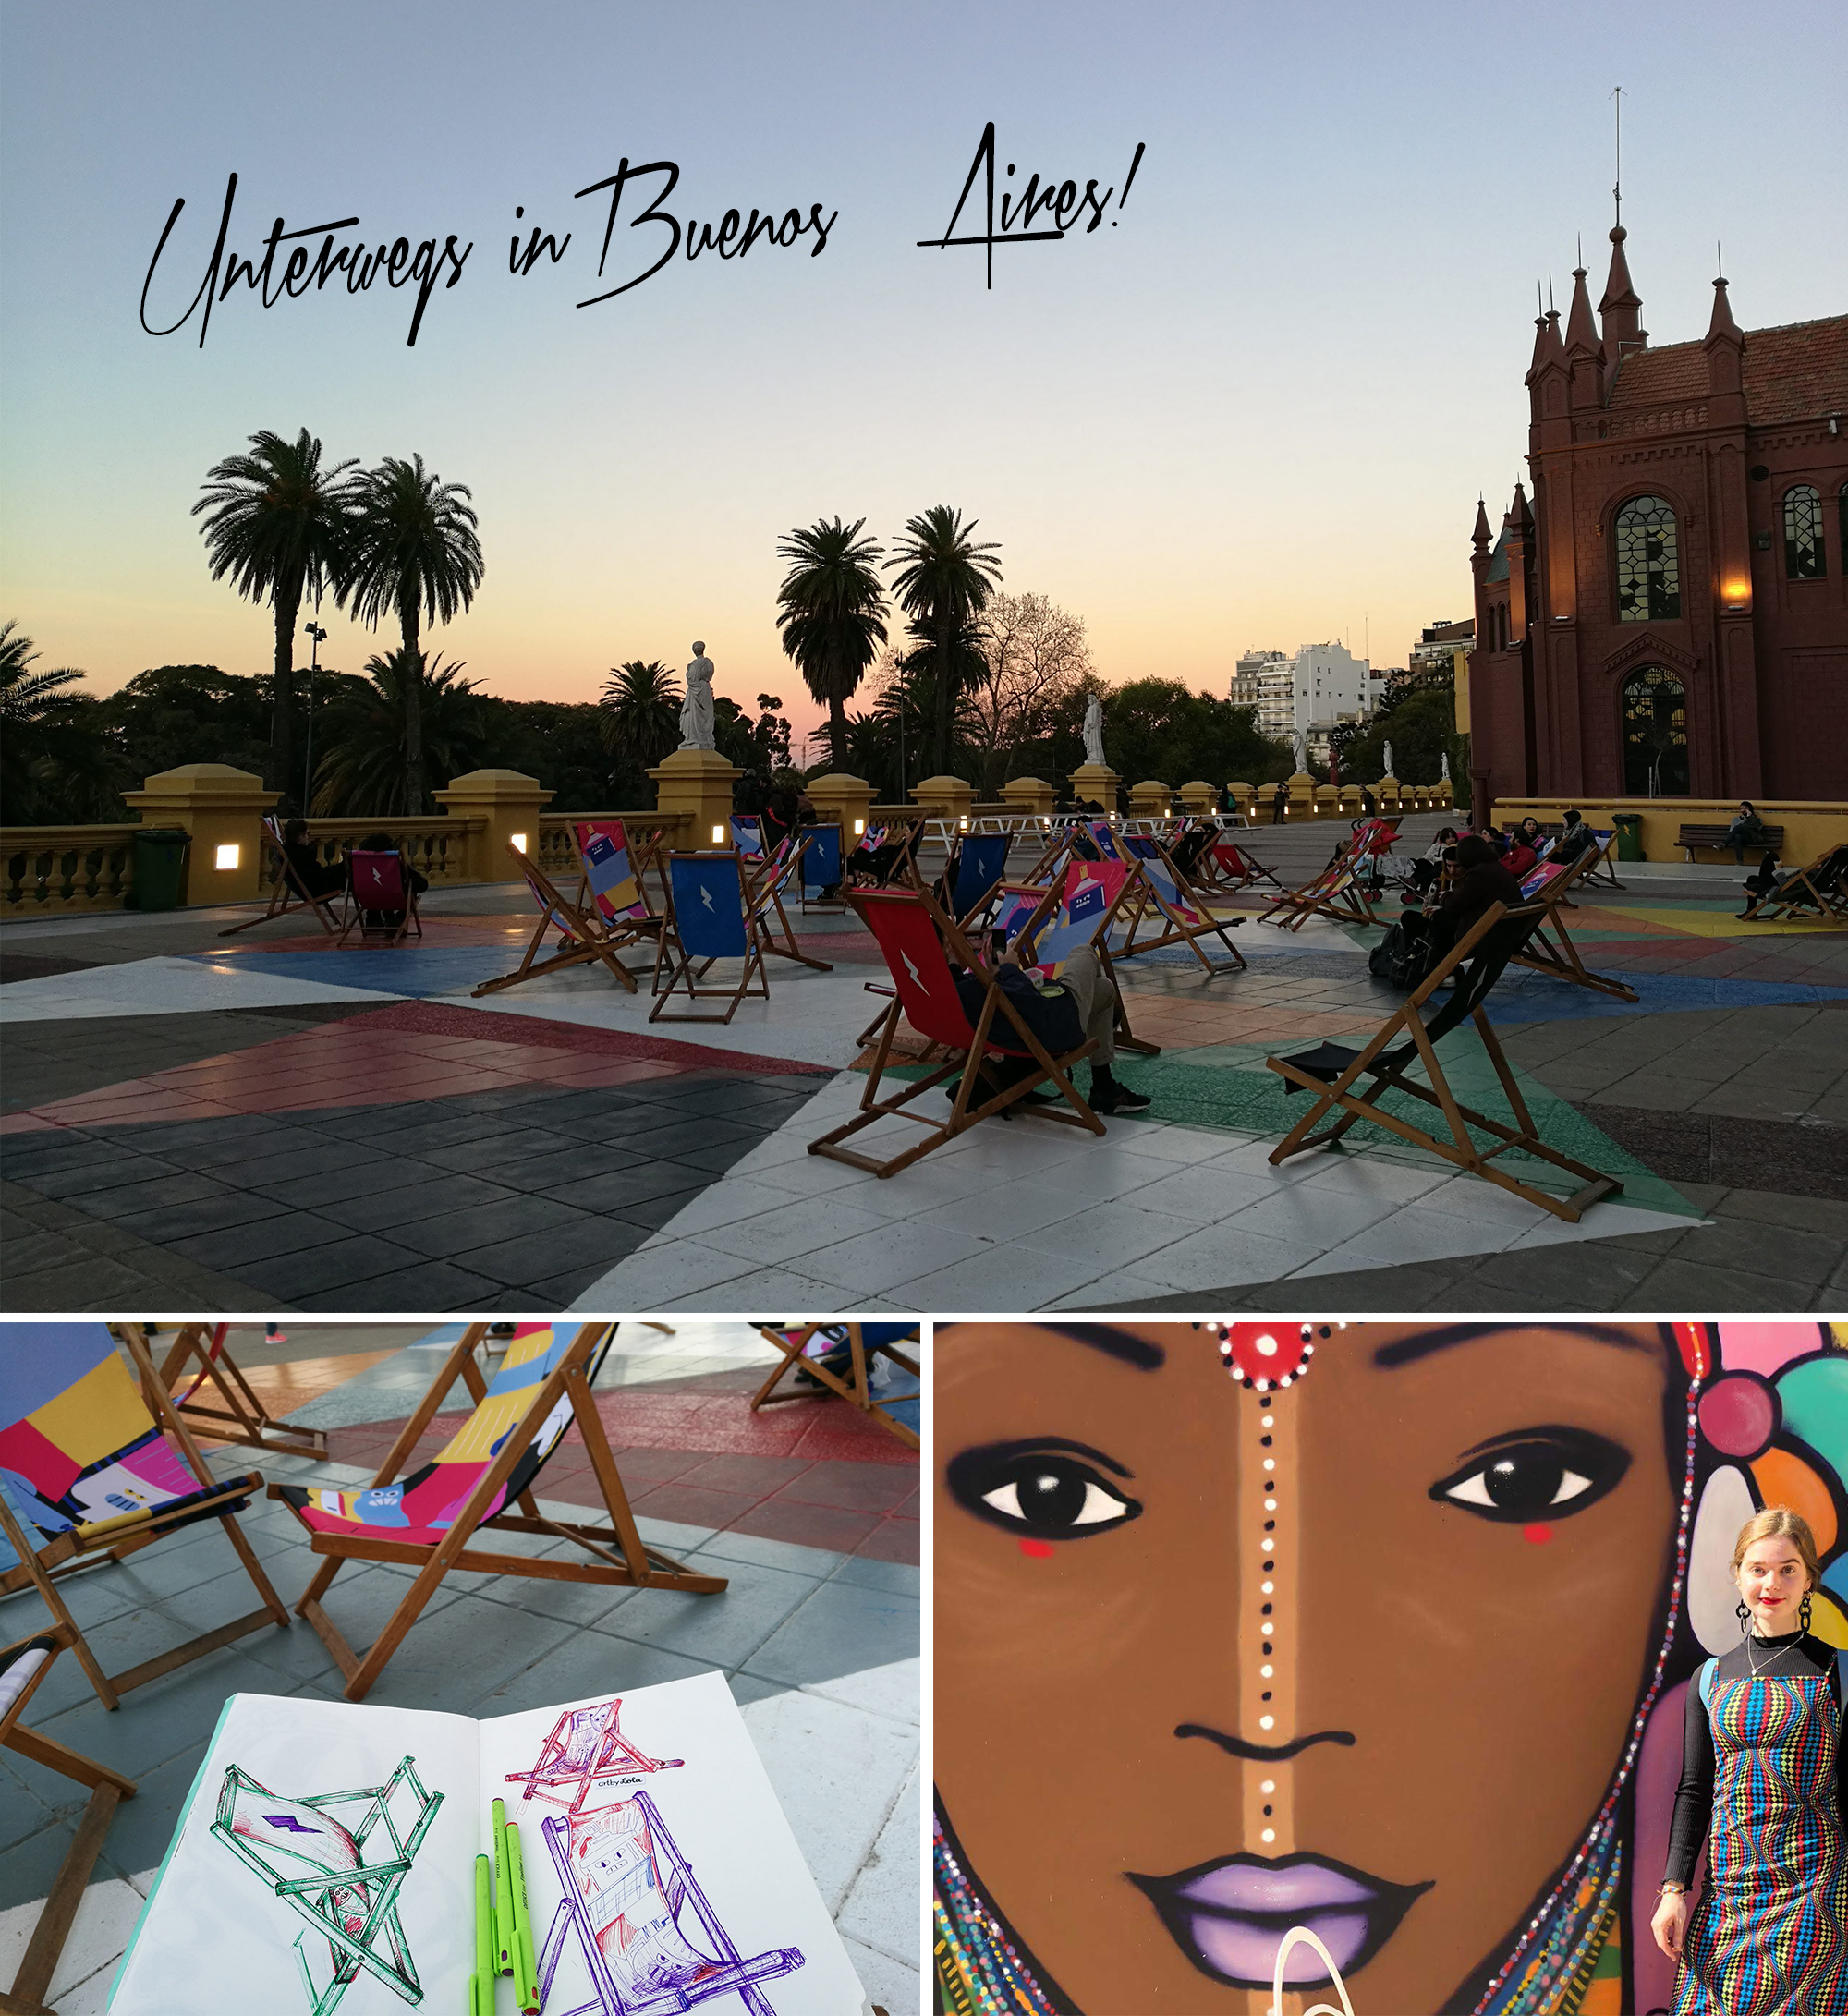 Femtastics_Lola-Behrens_BuenosAires_kulturzentrum